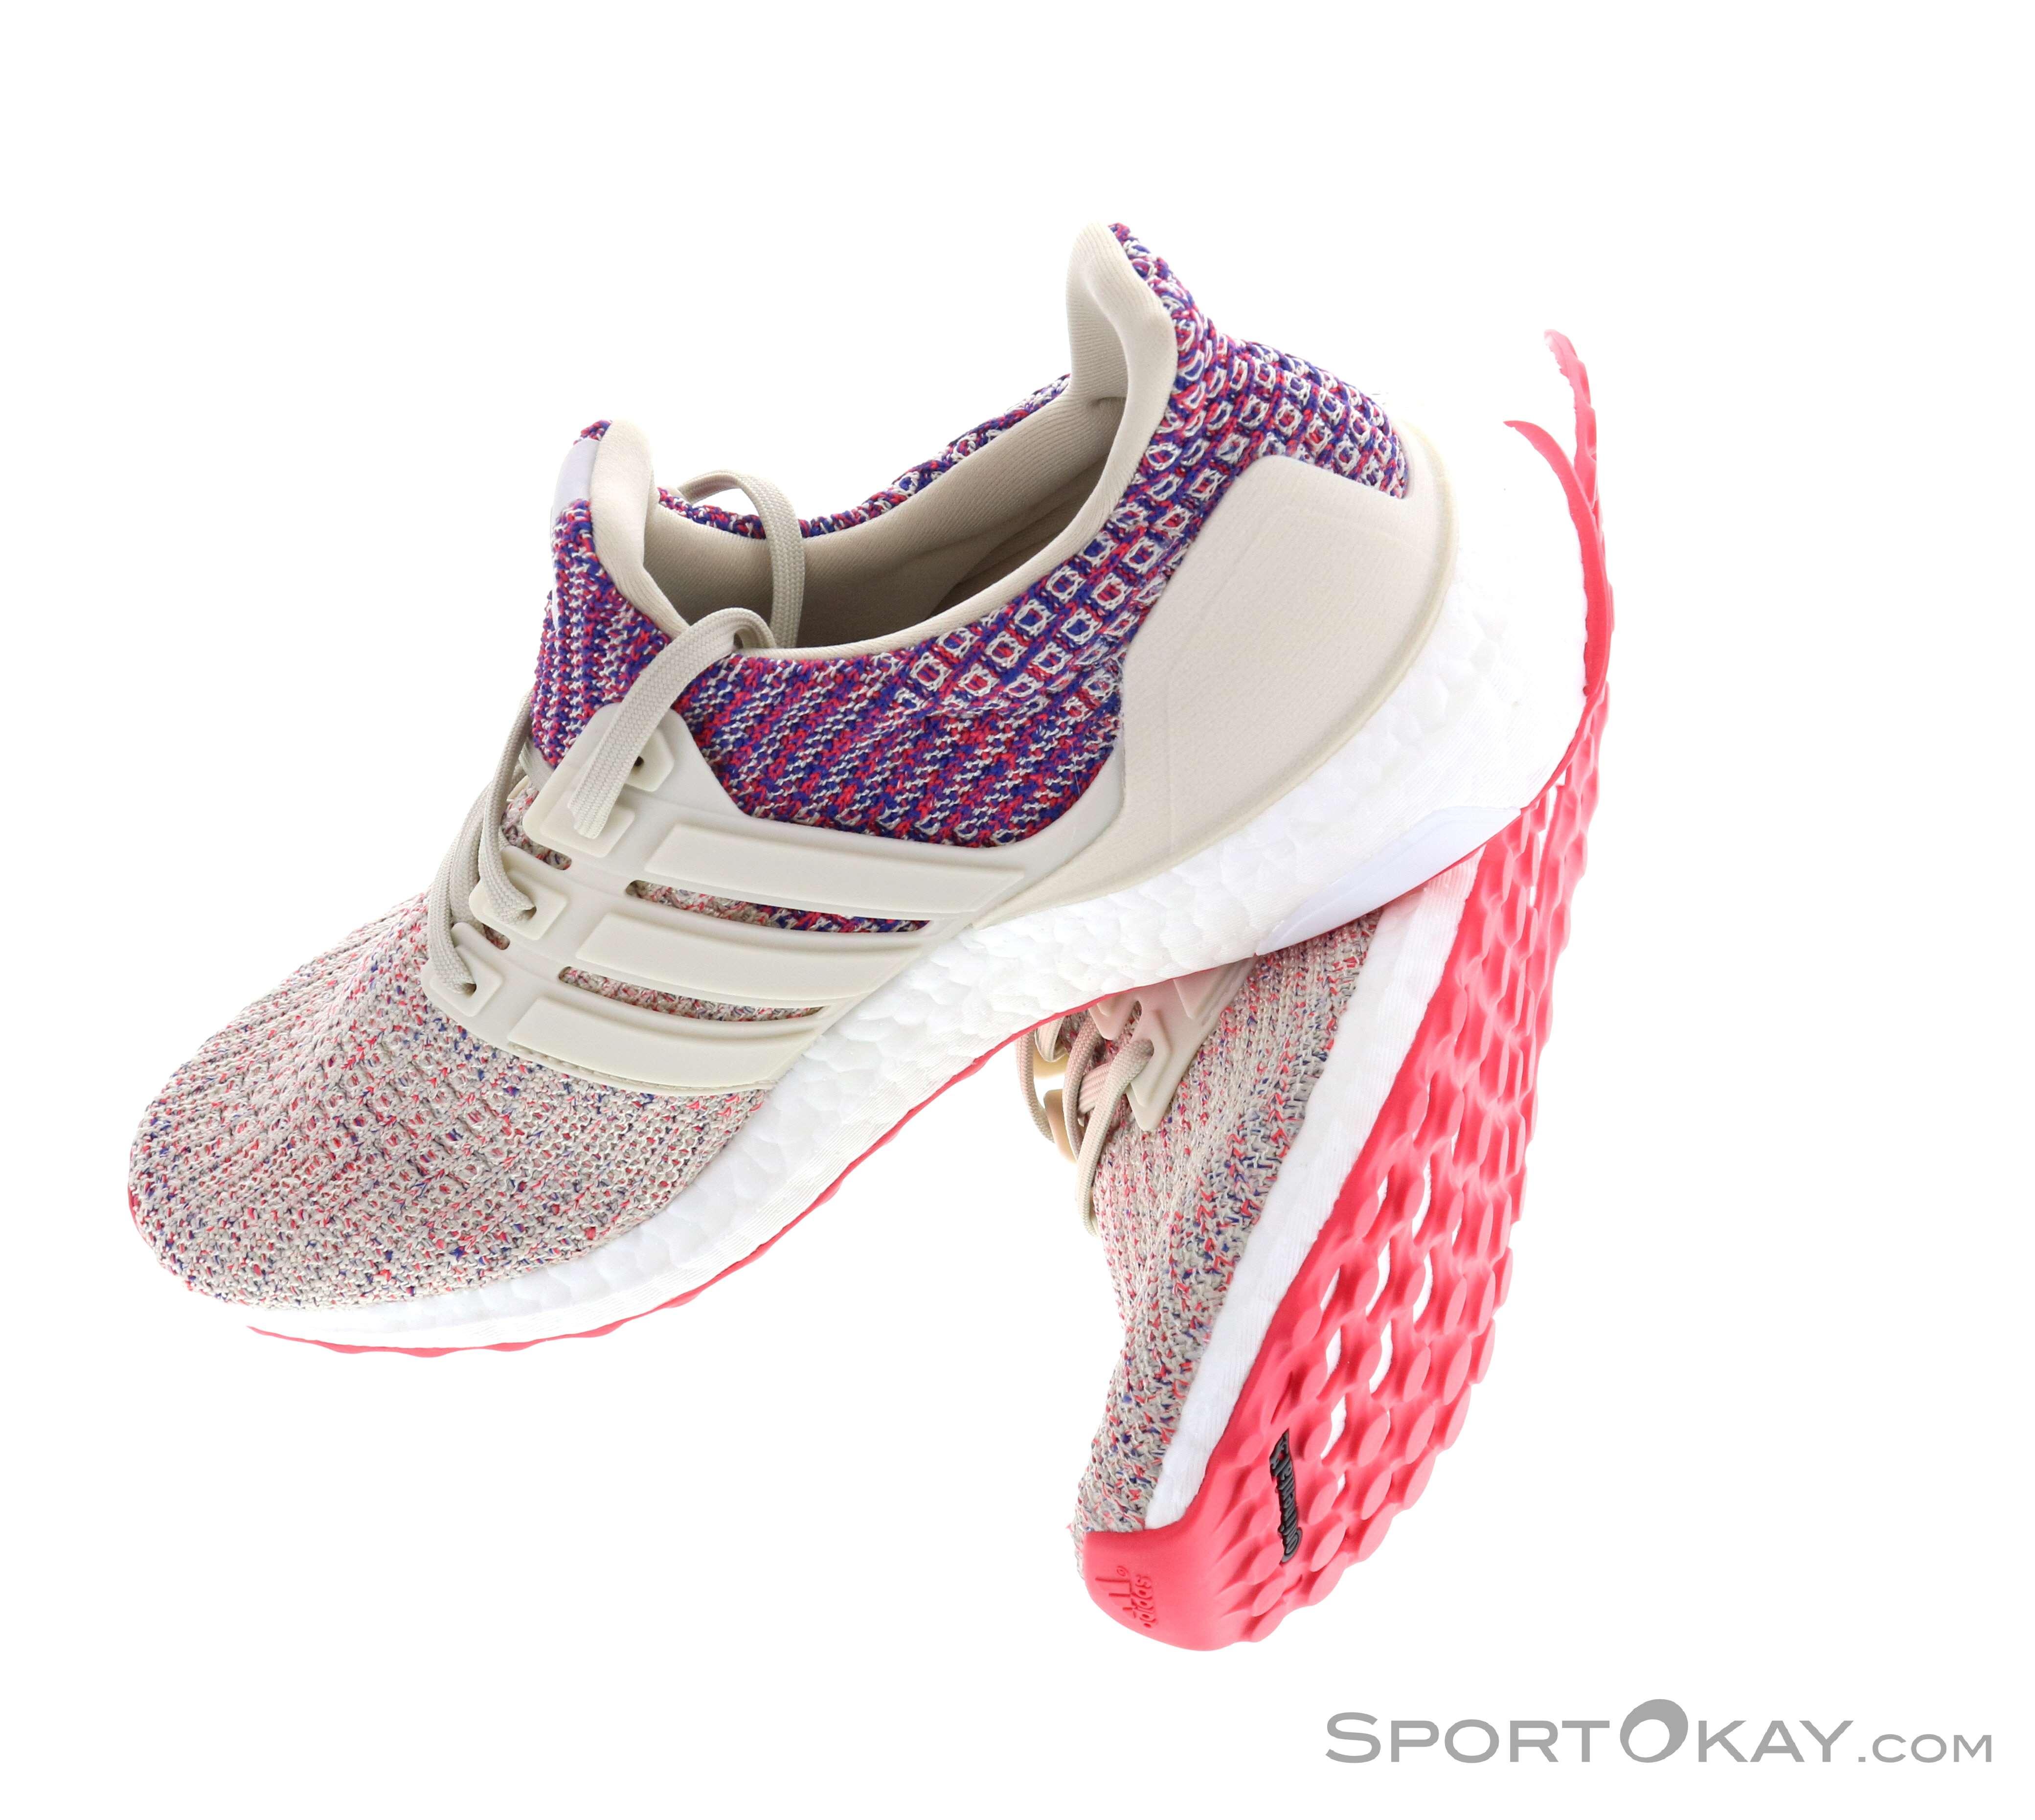 adidas Ultra Tech Real Lilac B37916 | Sneaker bar, Dress